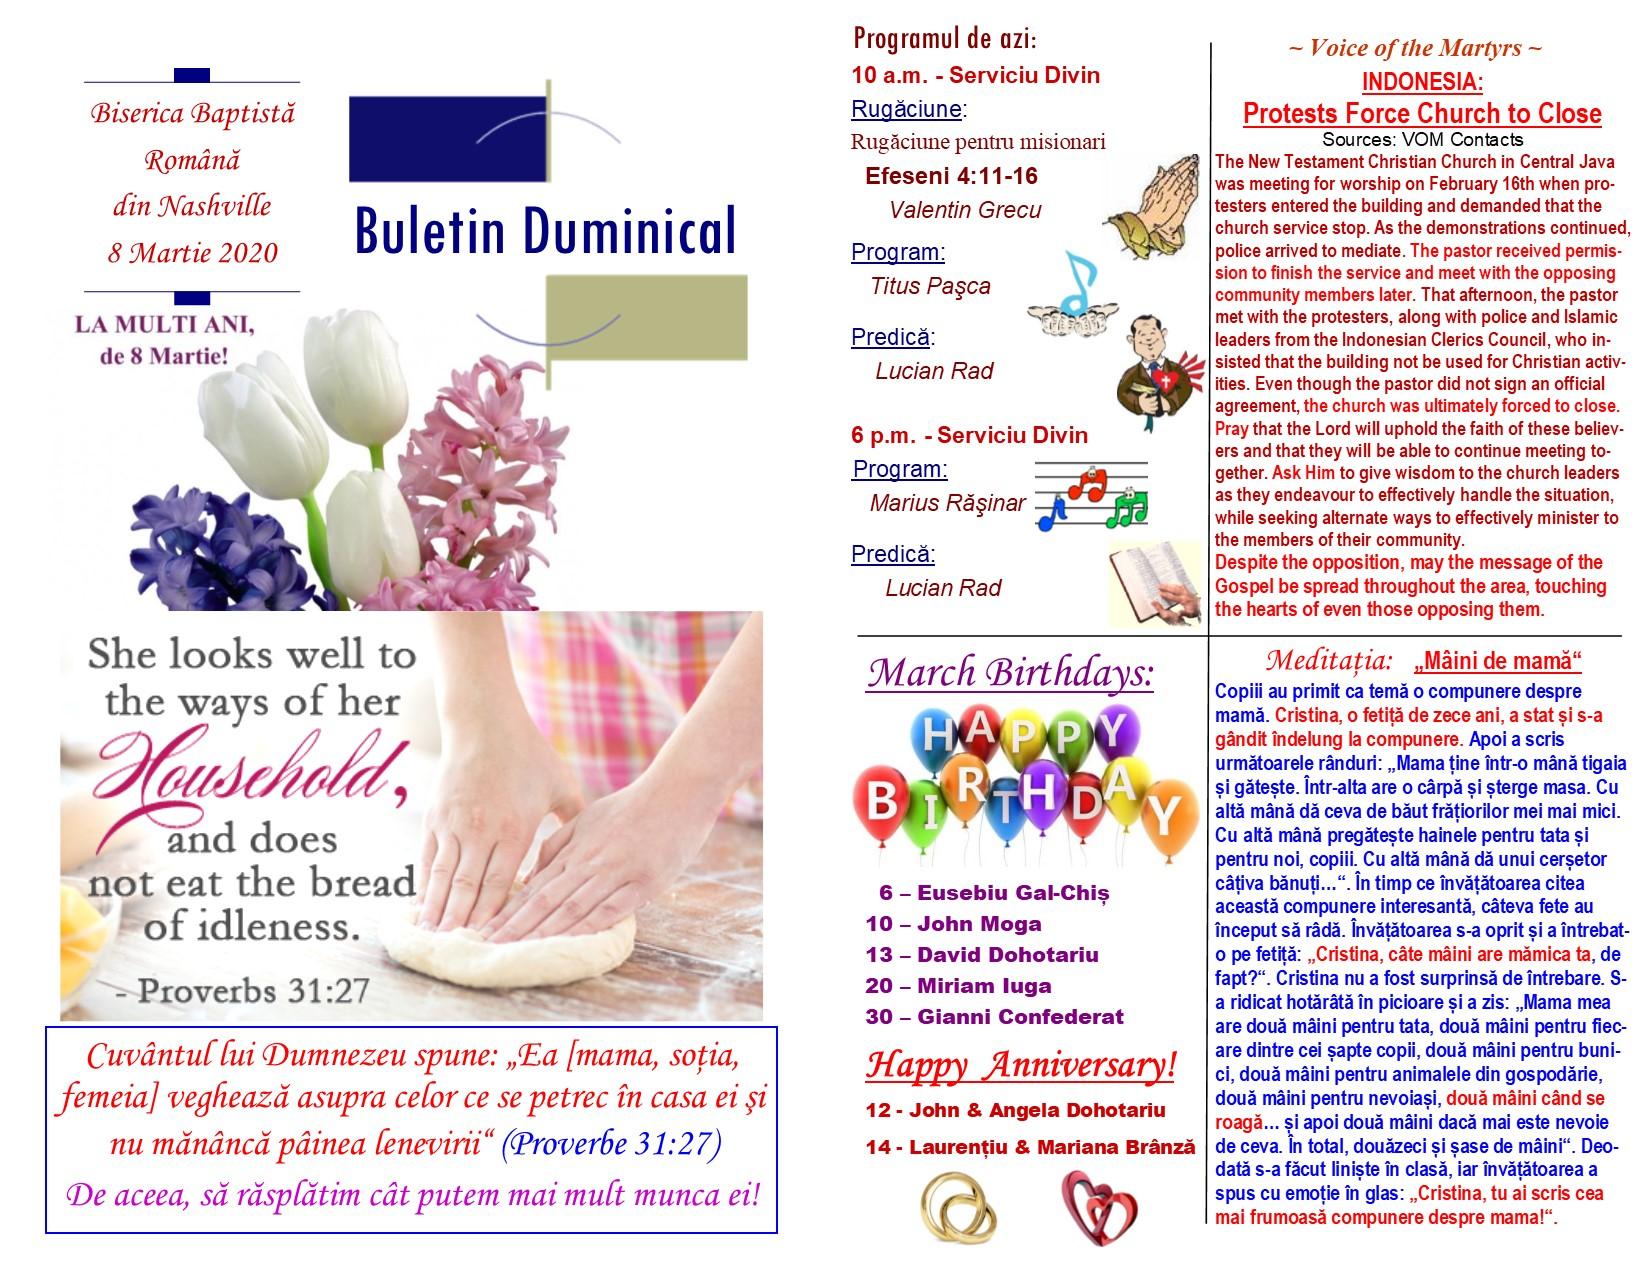 Buletin 03-08-20 page 1 & 2